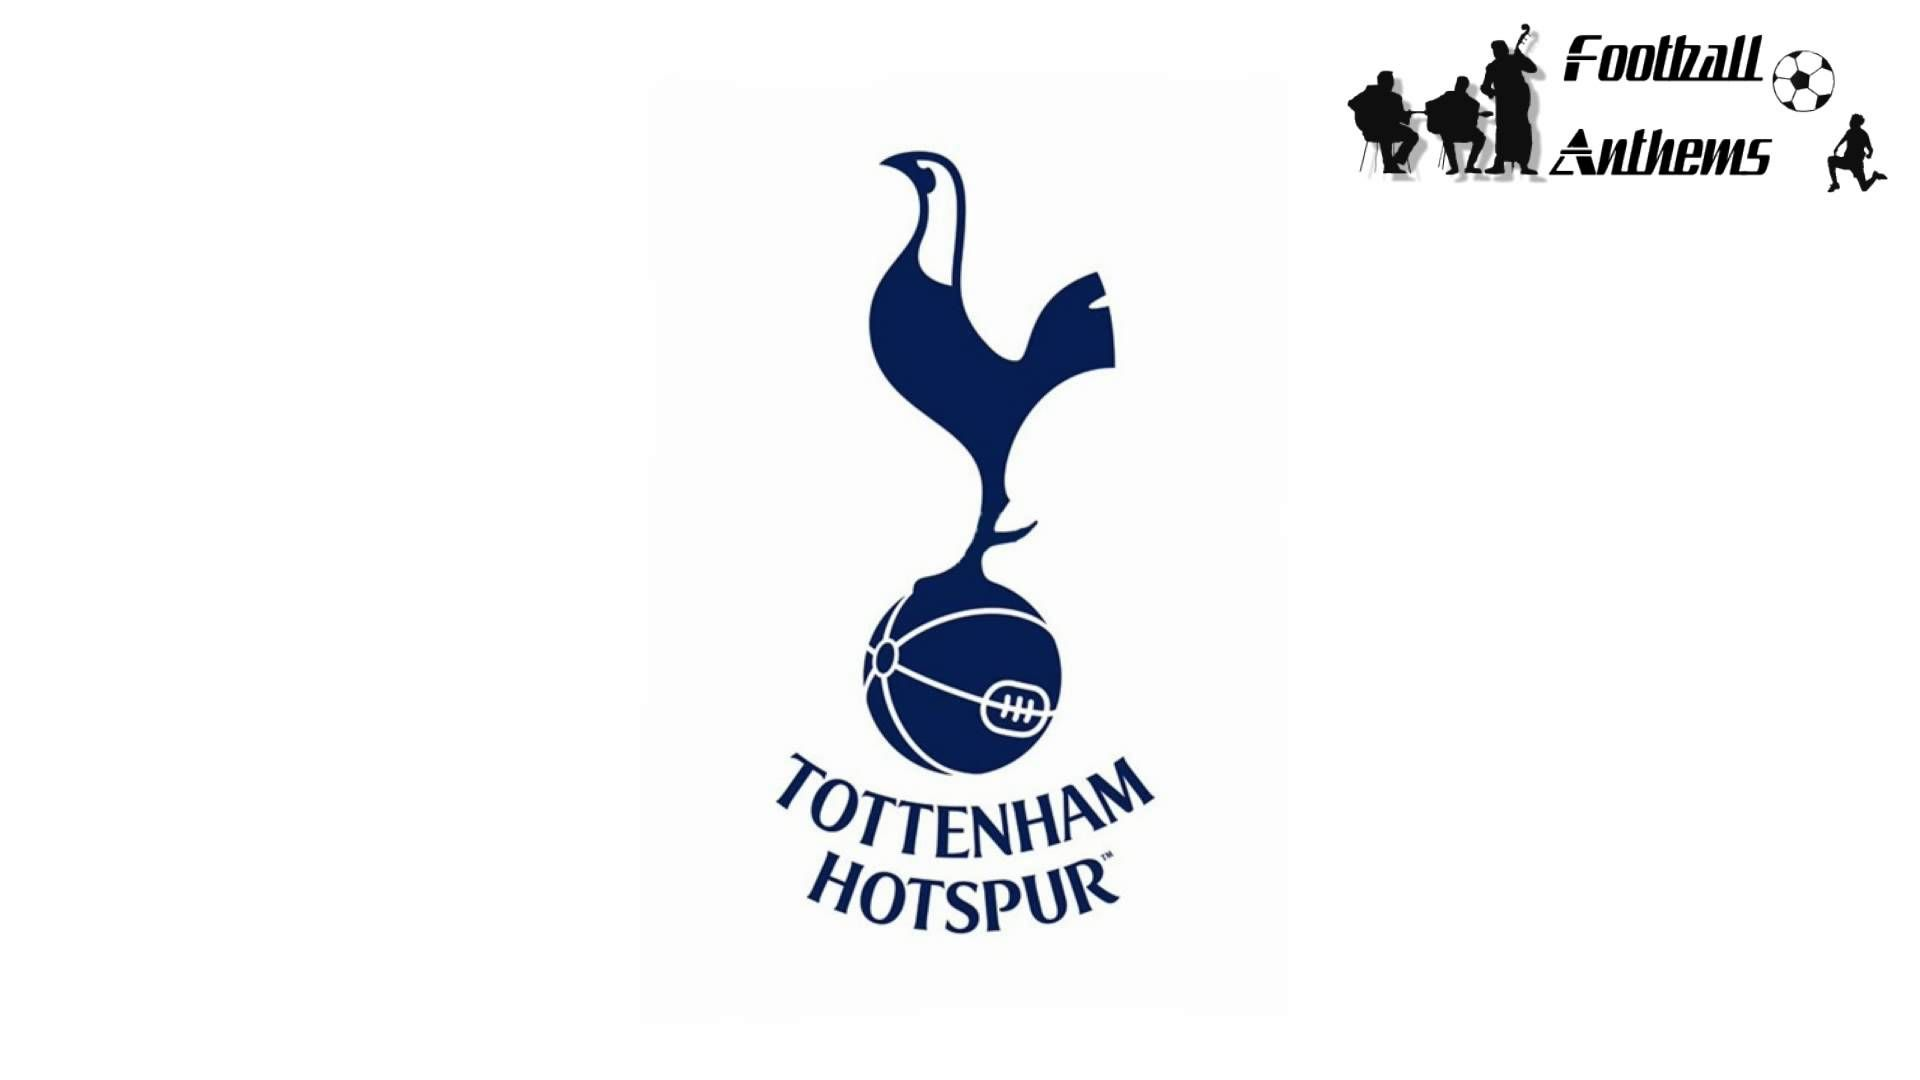 Tottenham Hotspur FC Official Football Gift Mens Graphic T-Shirt